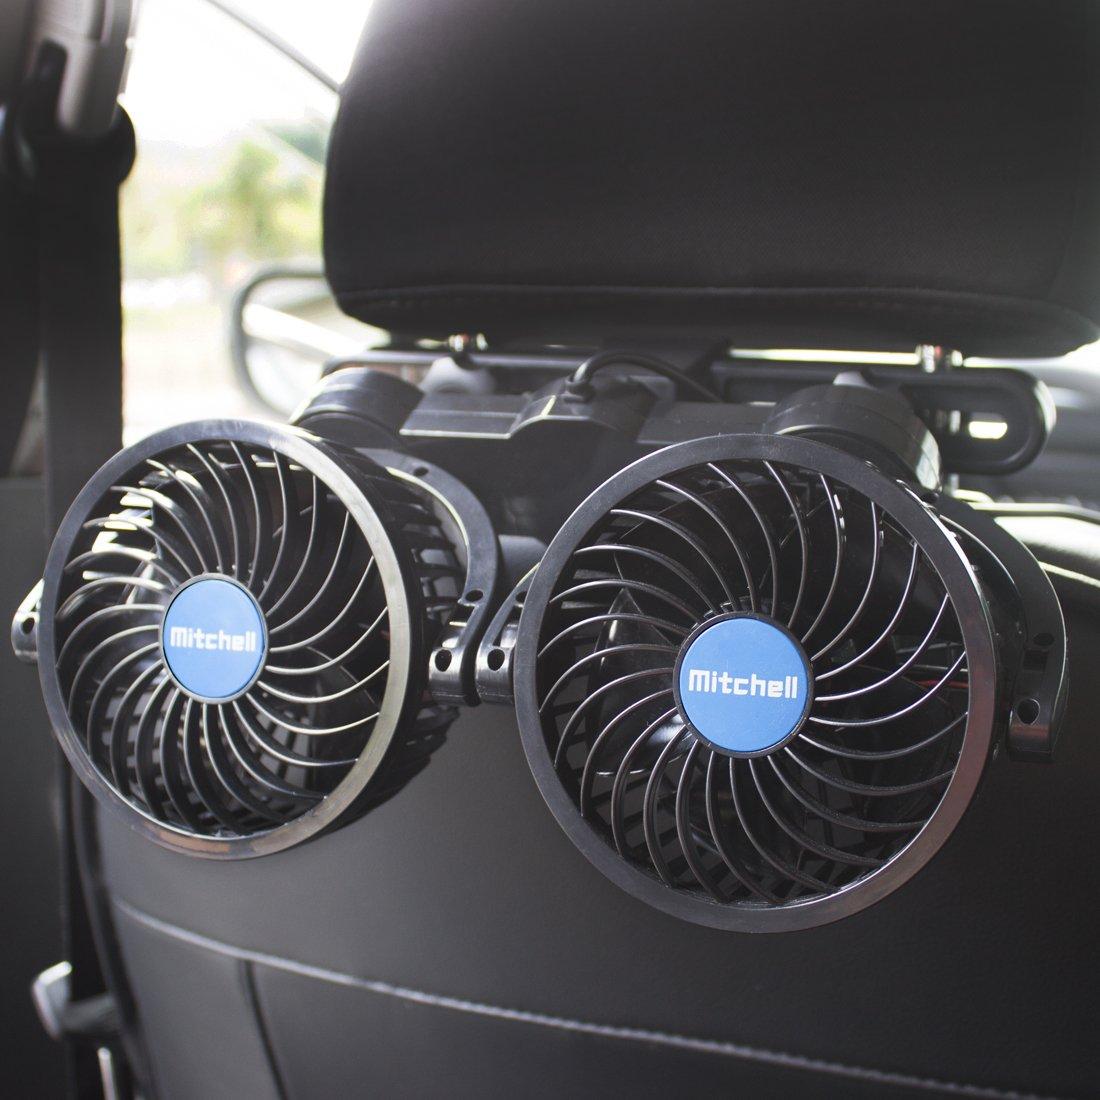 Poraxy Car Fans,12V Electric Auto Cooling Fan, Headrest 360 Degree Rotatable Dual Head Stepless Speed Rear Seat Air Fan for Sedan SUV RV Boat by Poraxy